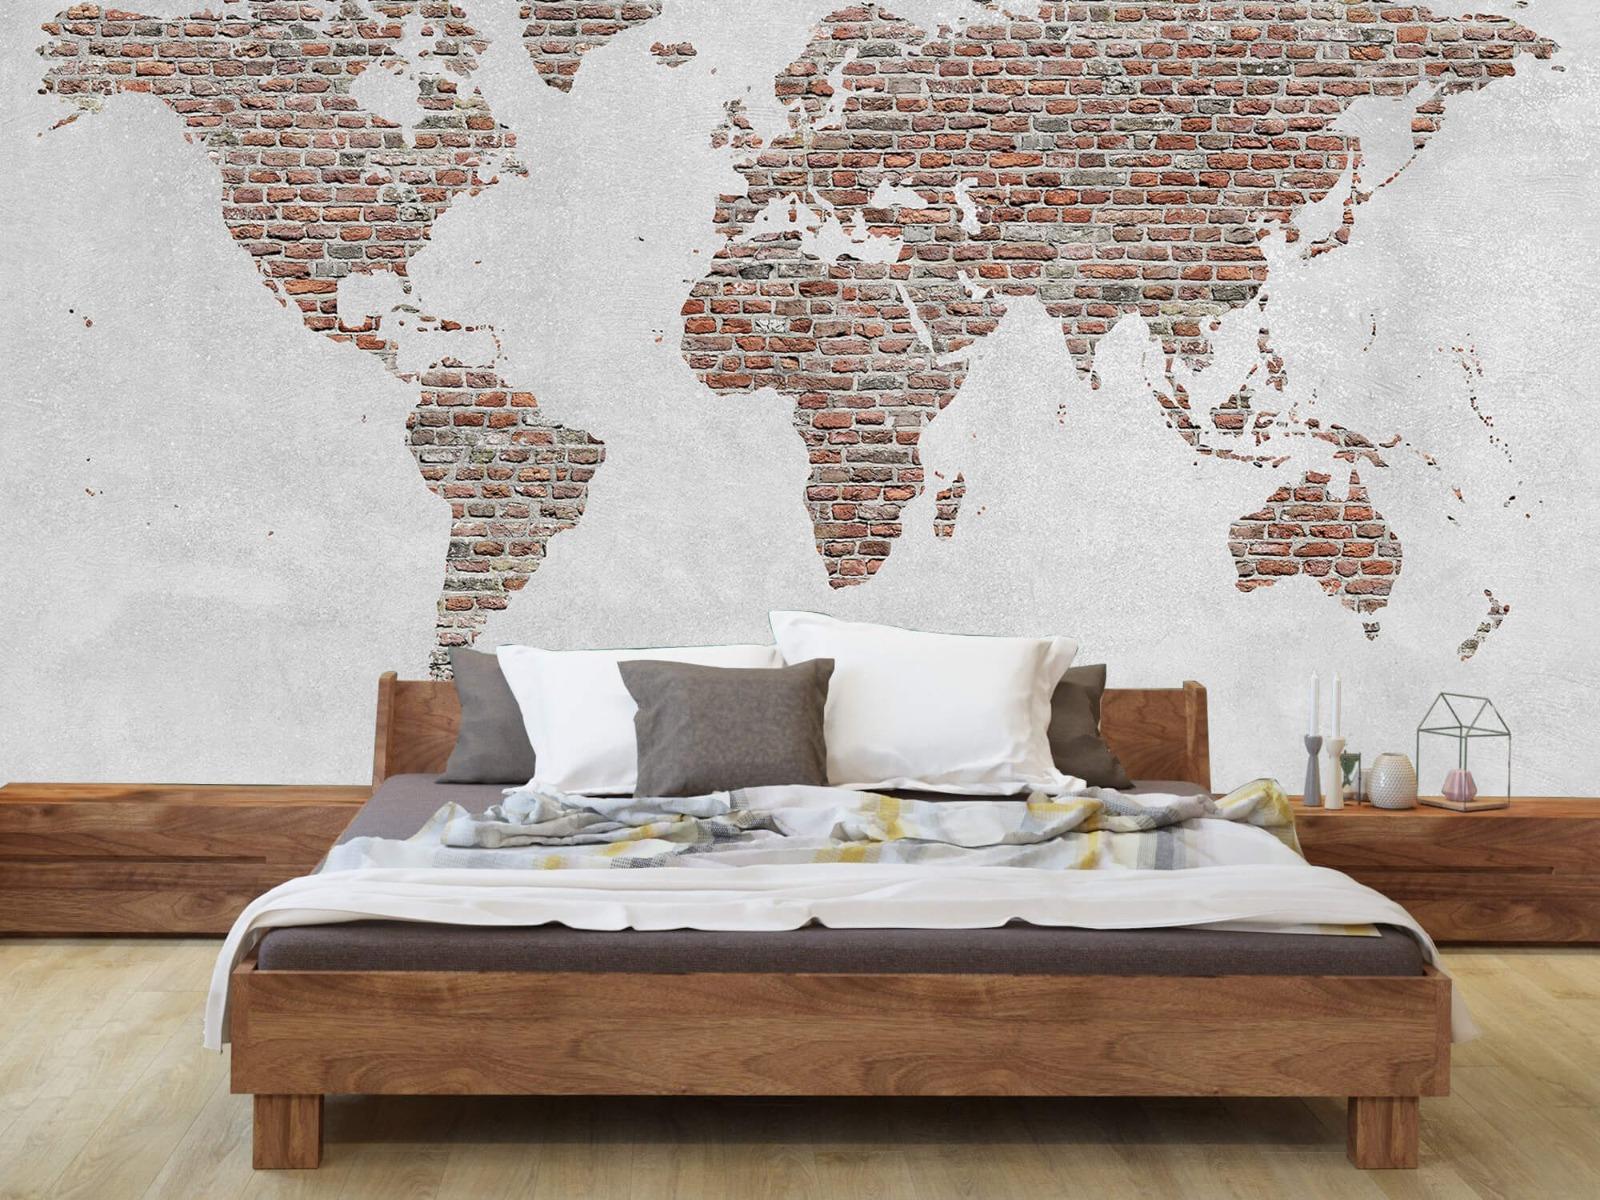 Steen behang - Wereldkaart stenen - Slaapkamer 7